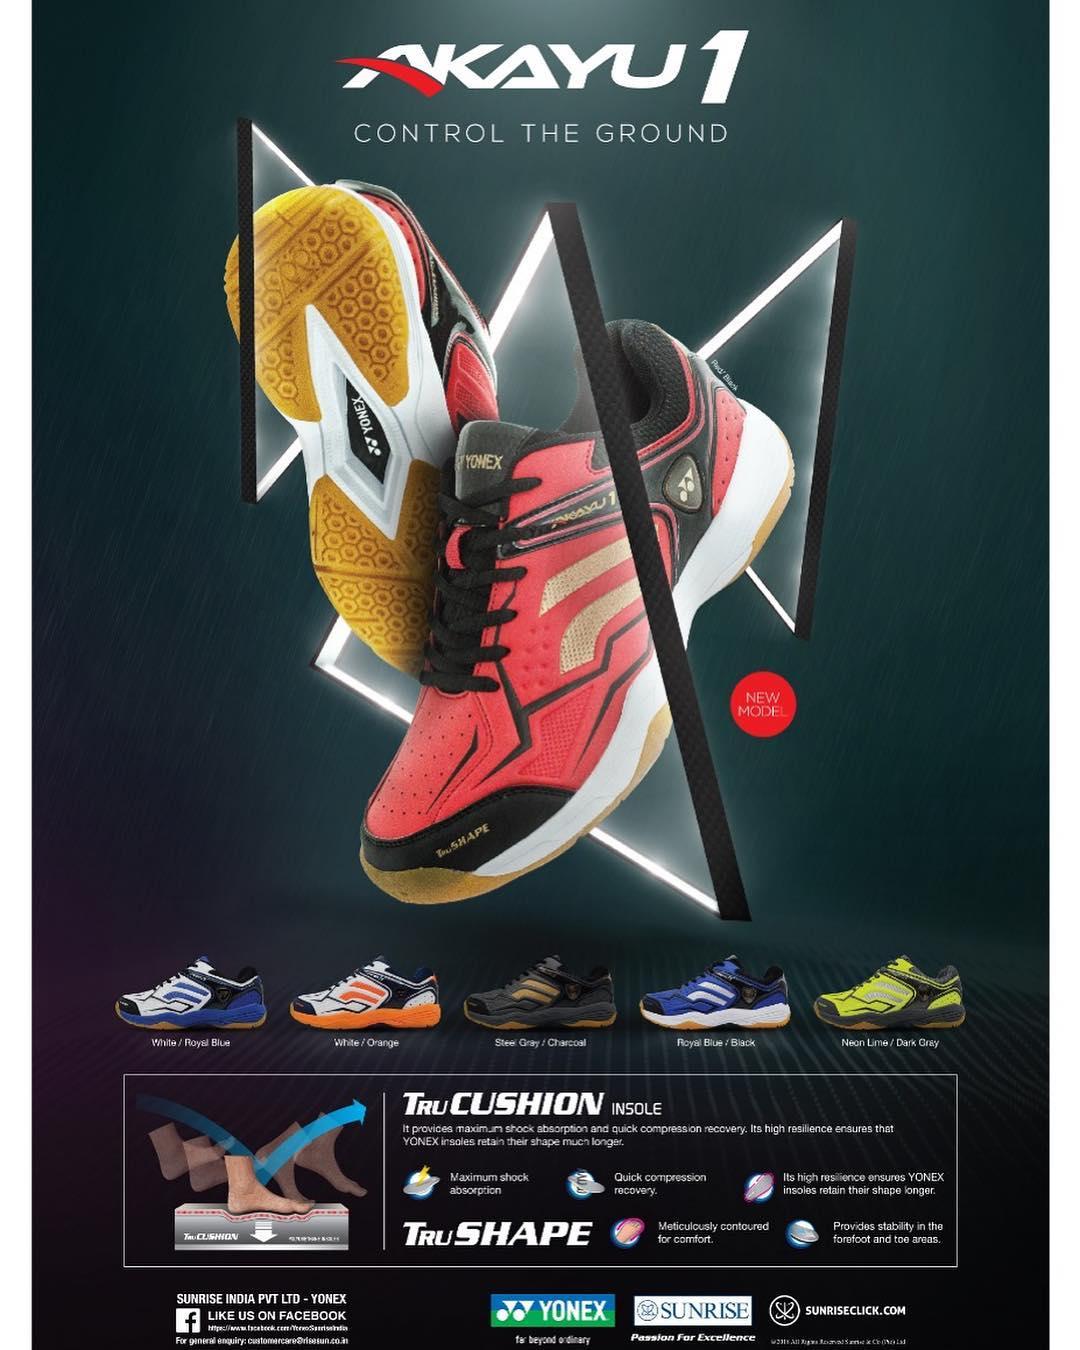 akayu1 non marking yonex shoes